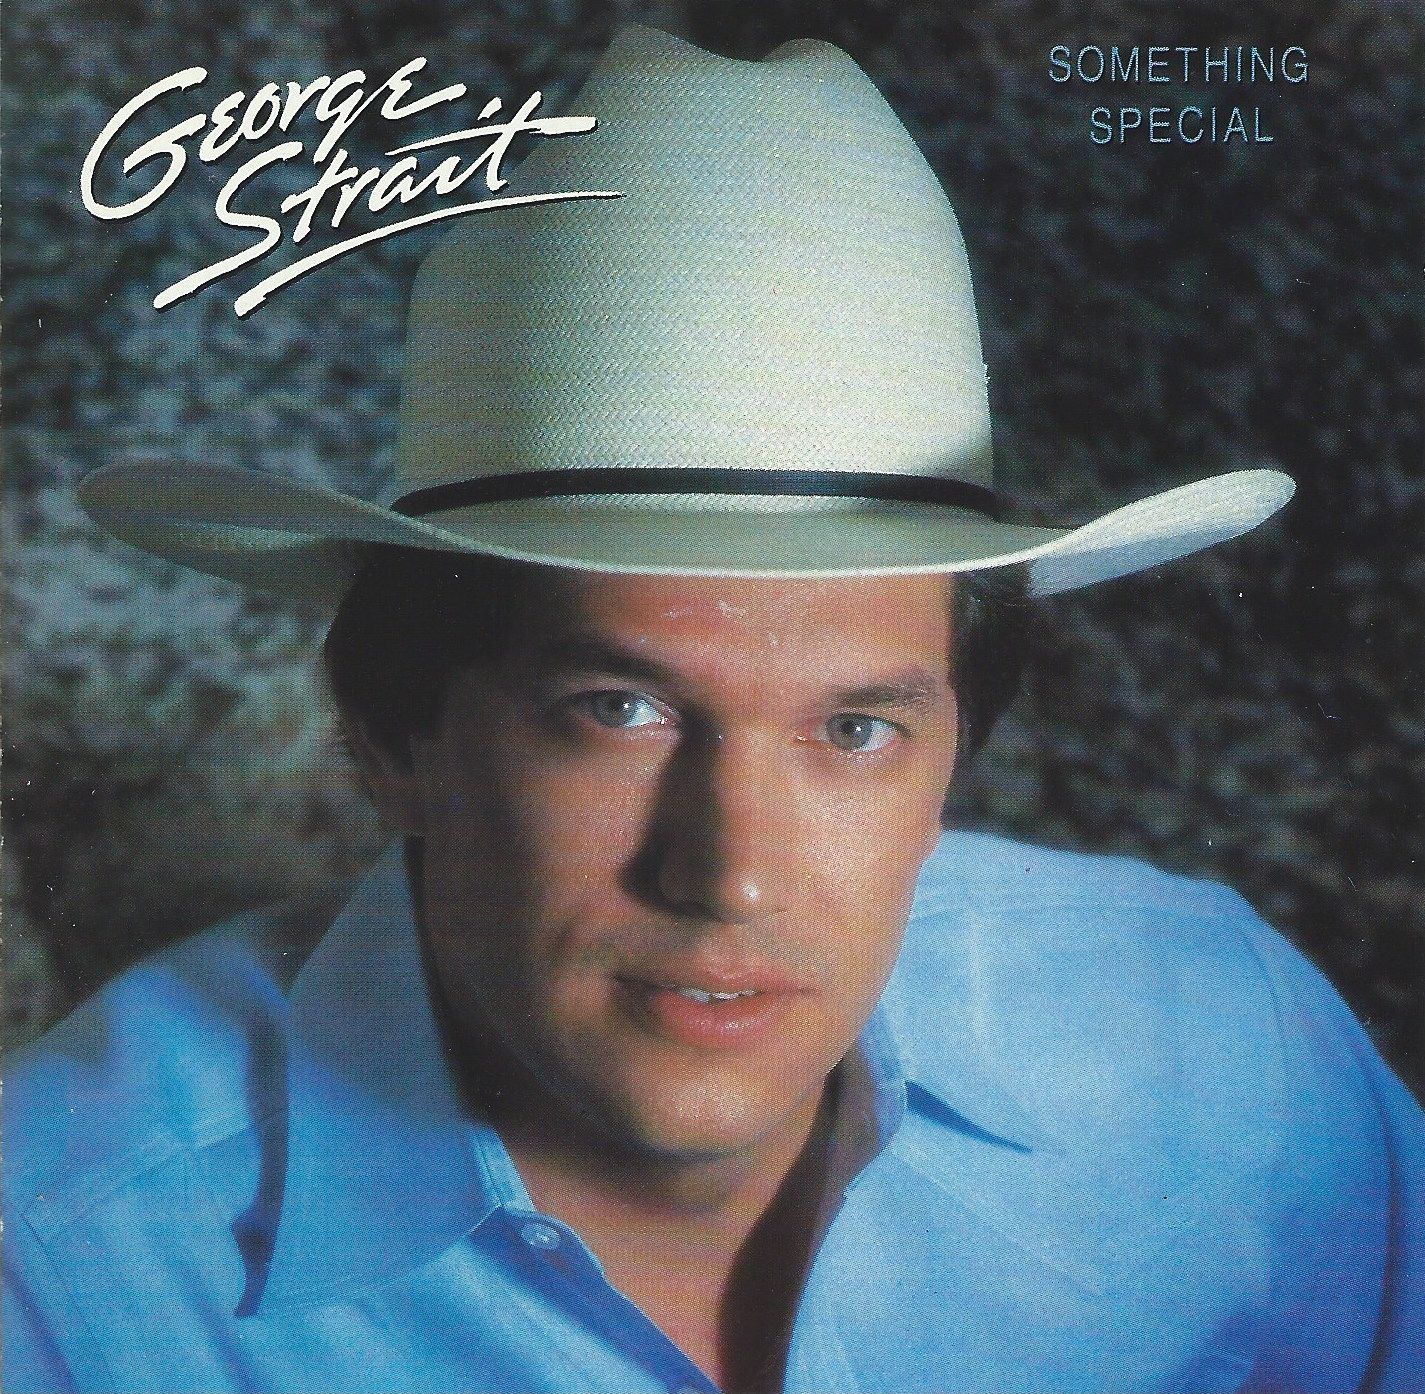 George Strait - Something Special - Album Cover